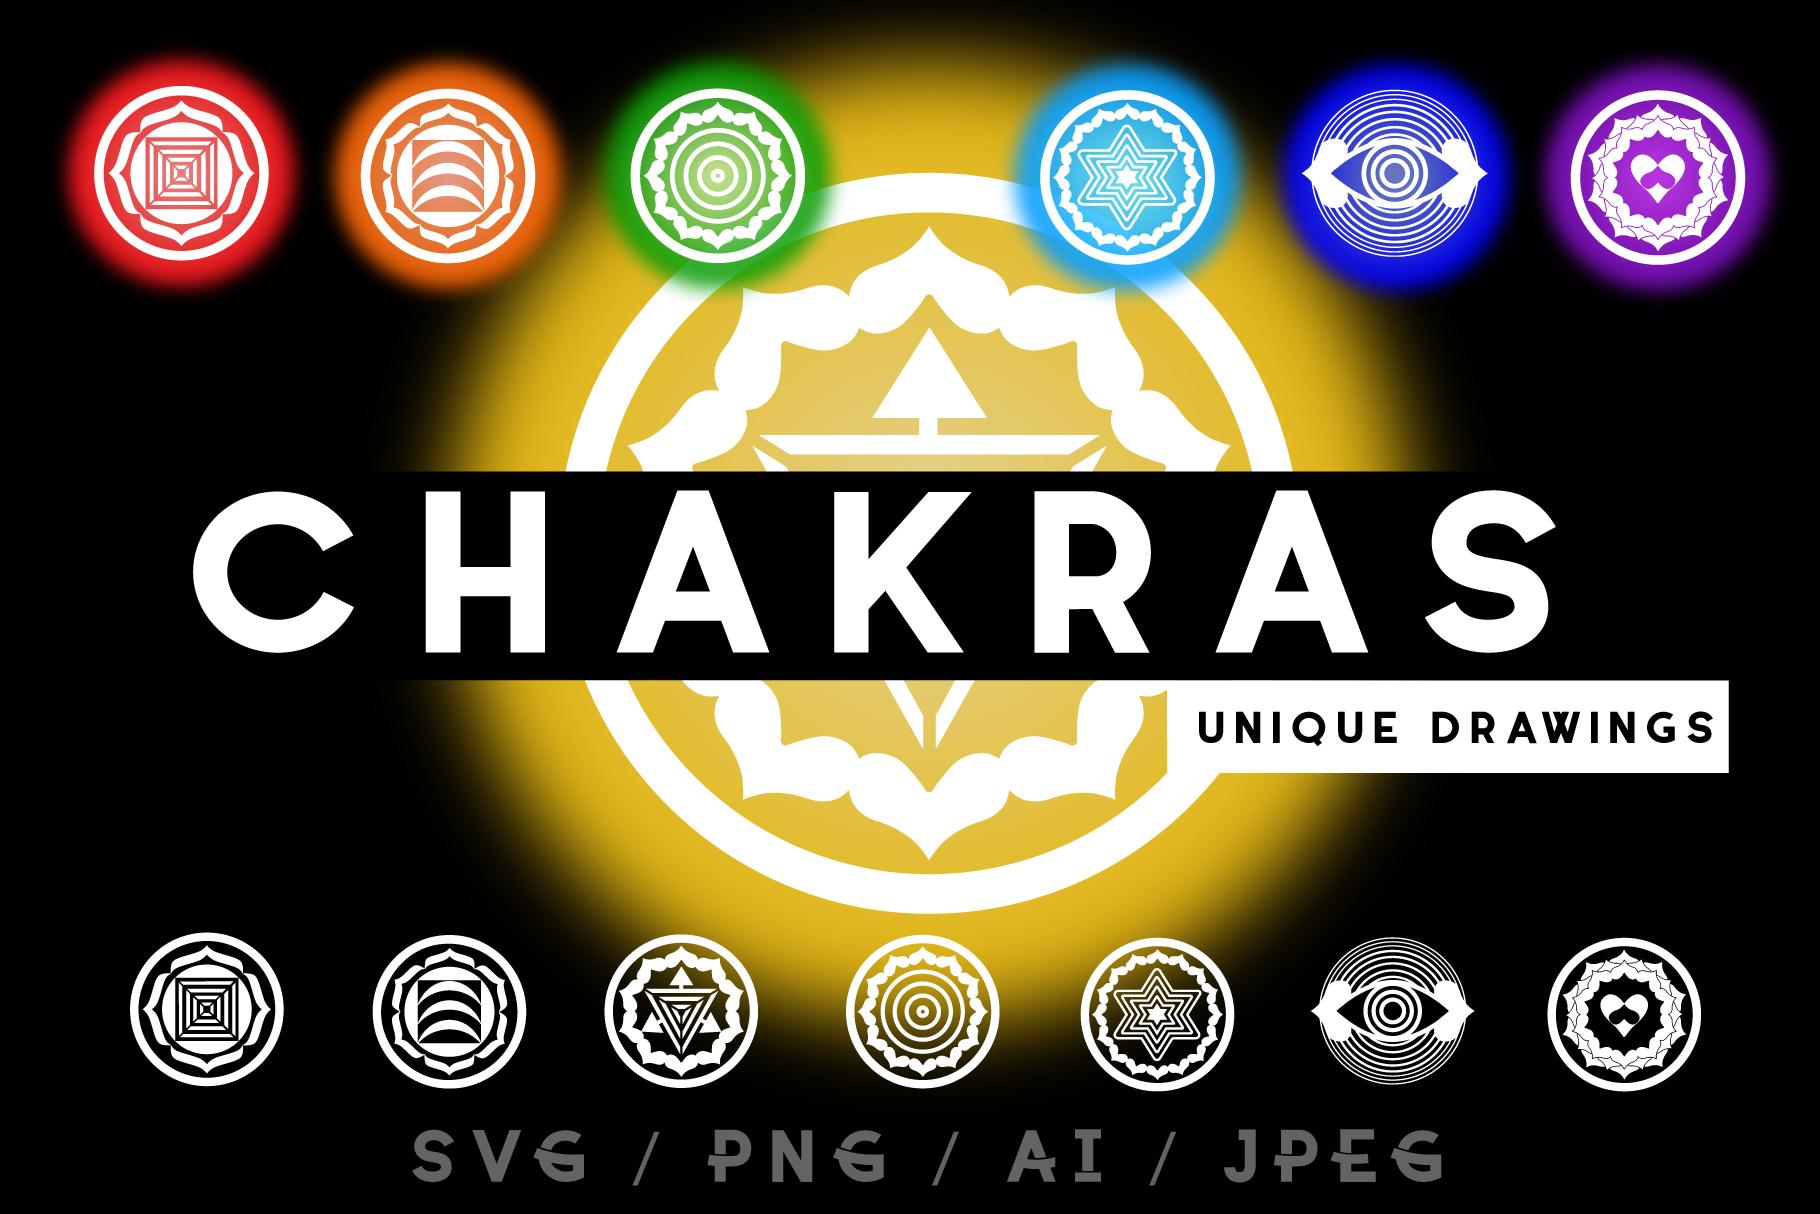 Chakras. Unique drawing. SVG/PNG/AI/JPEG example image 1